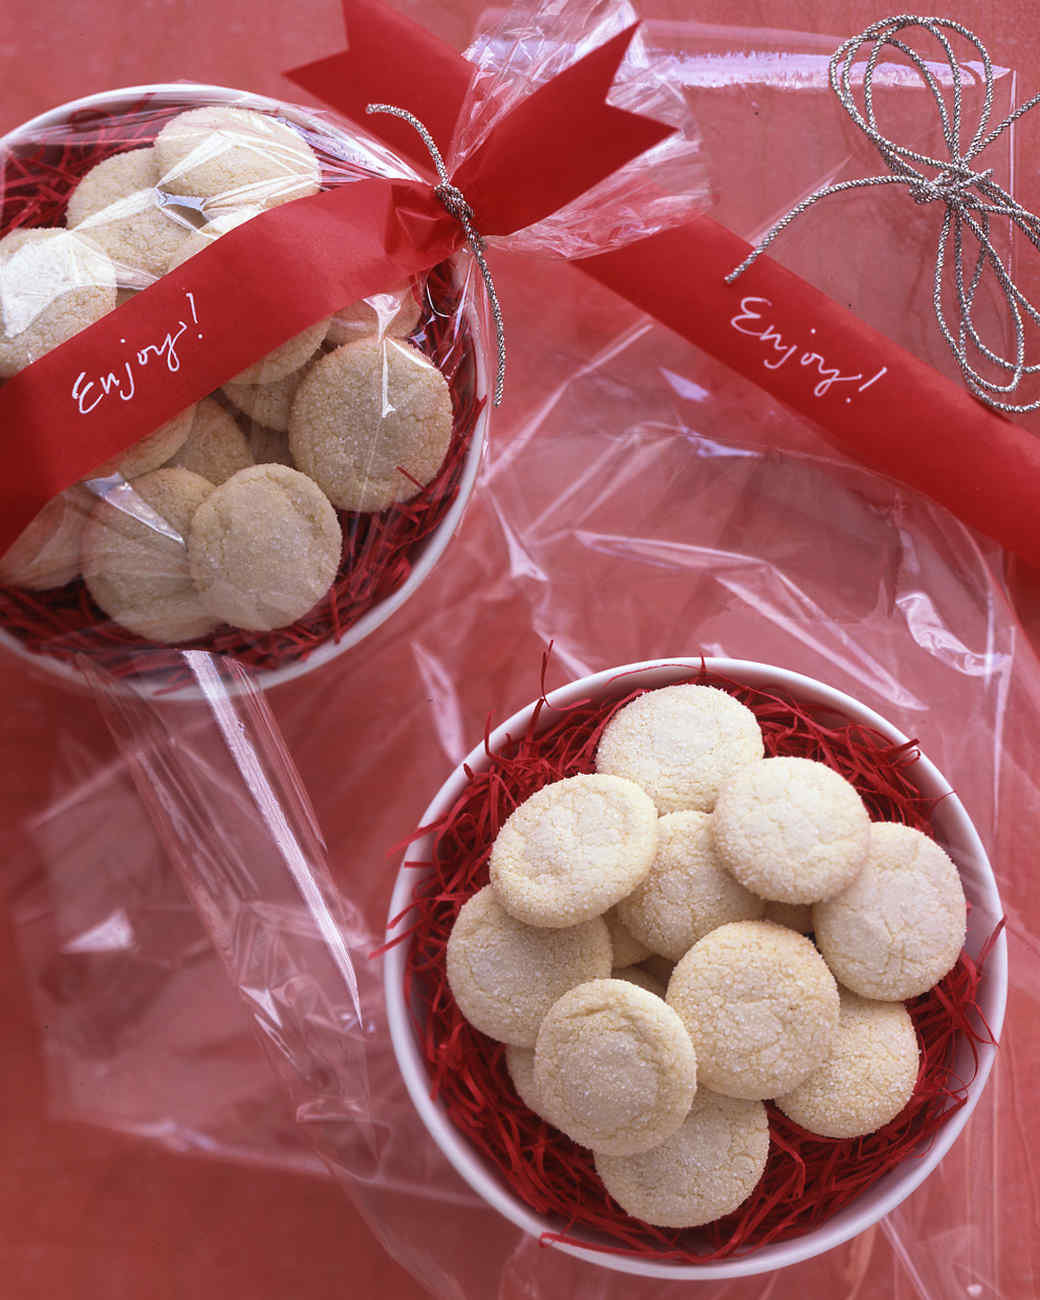 Crisp Anise Cookies